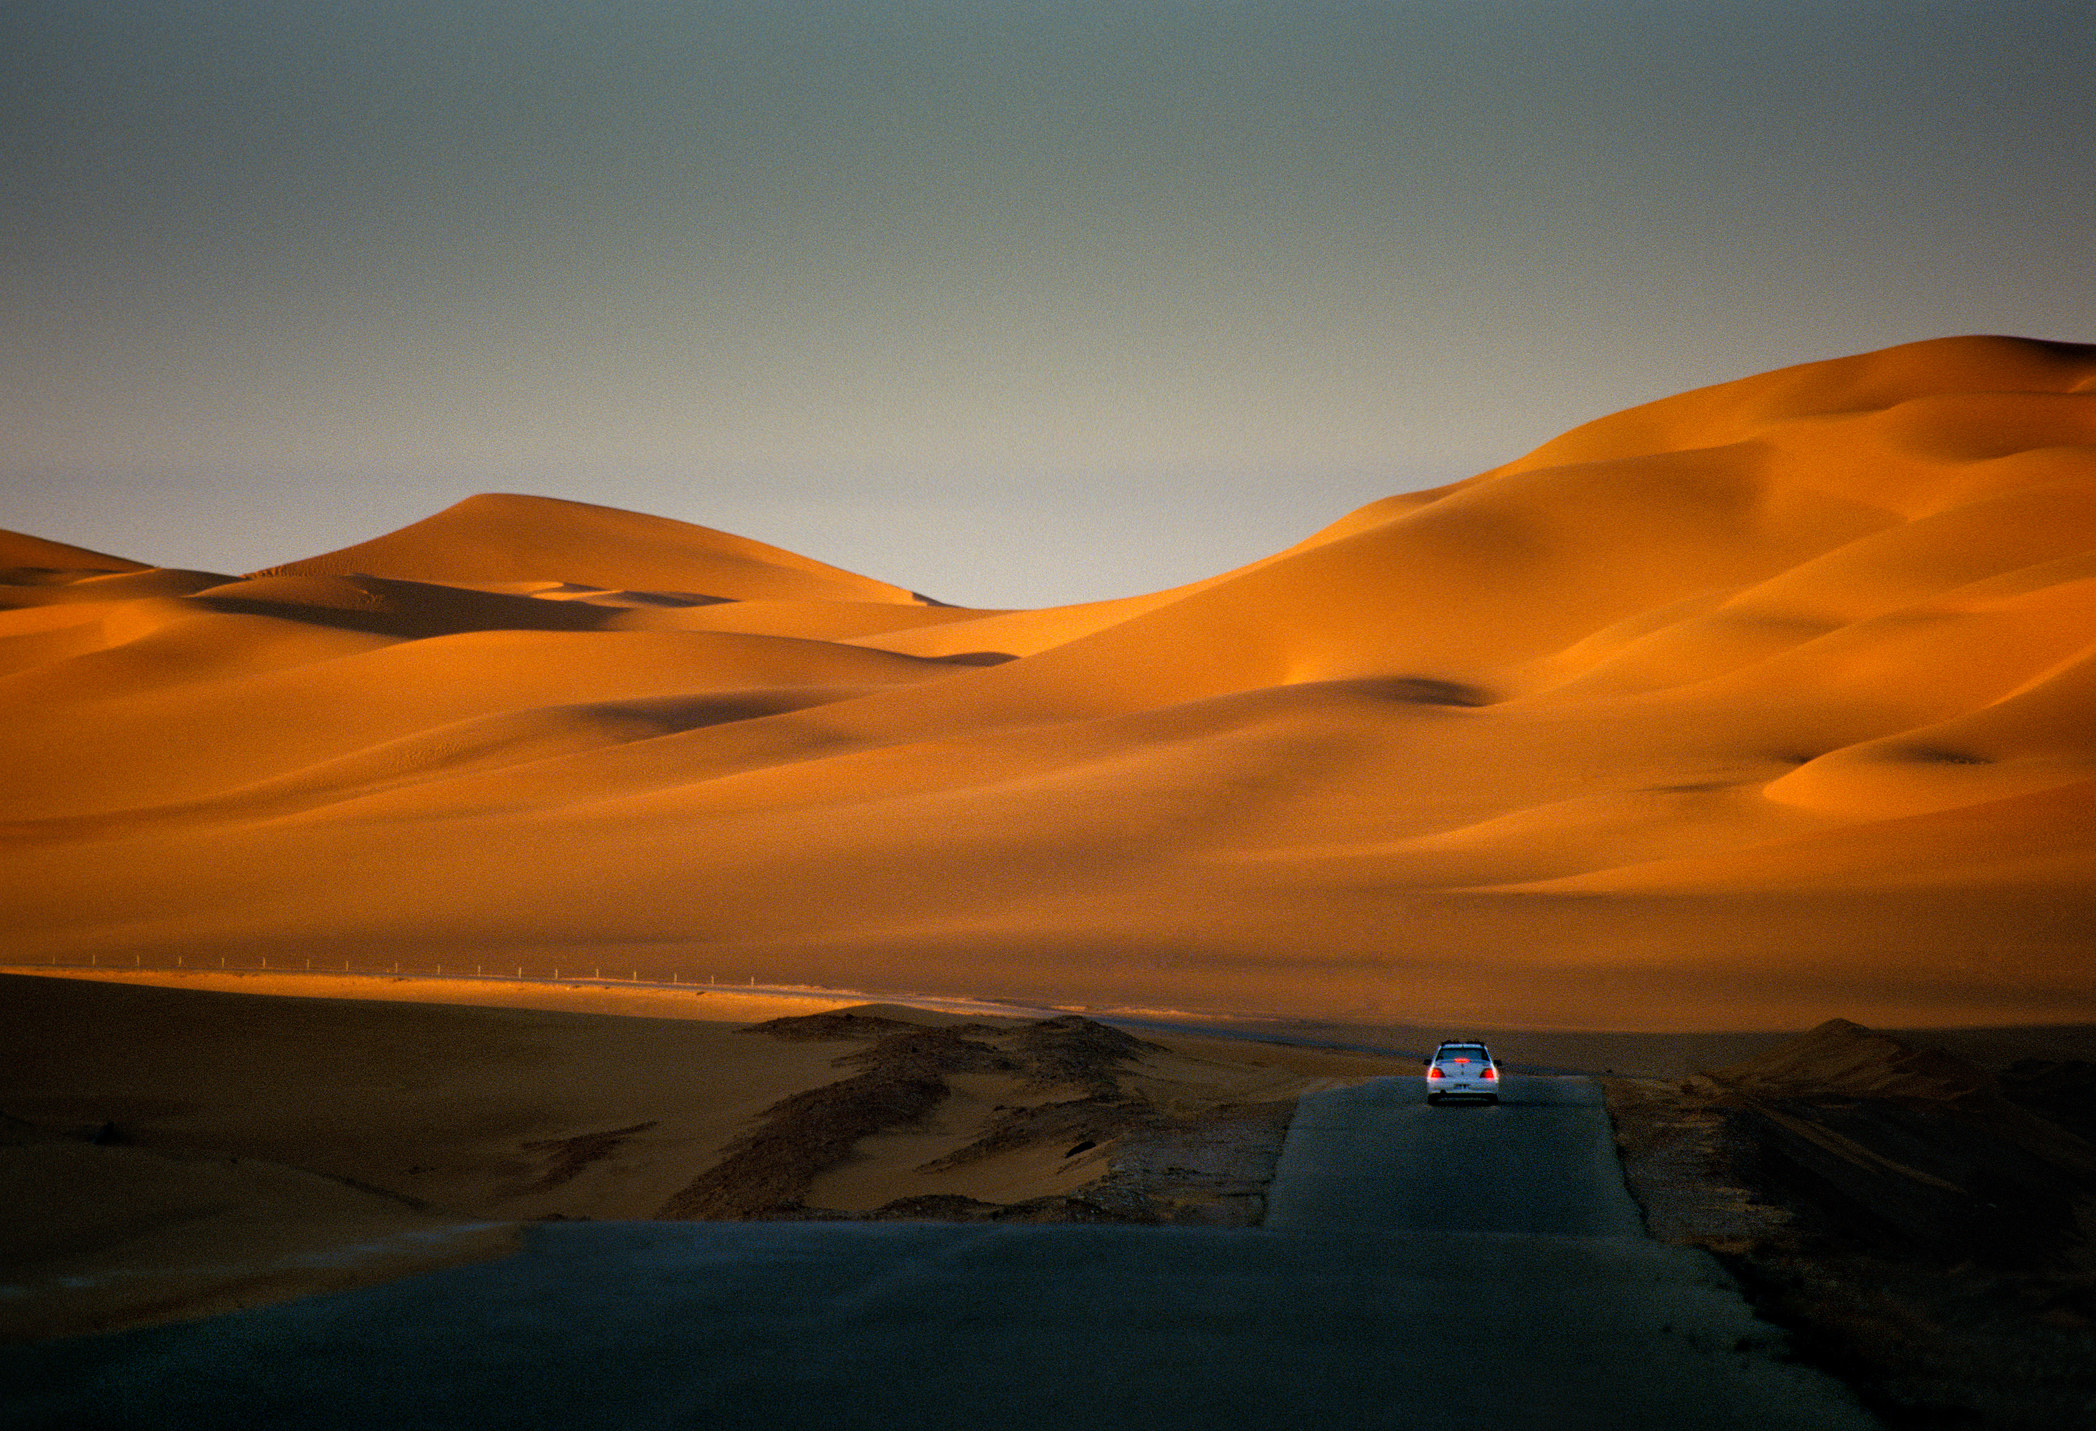 A road leading to the Sahara desert sand dunes.